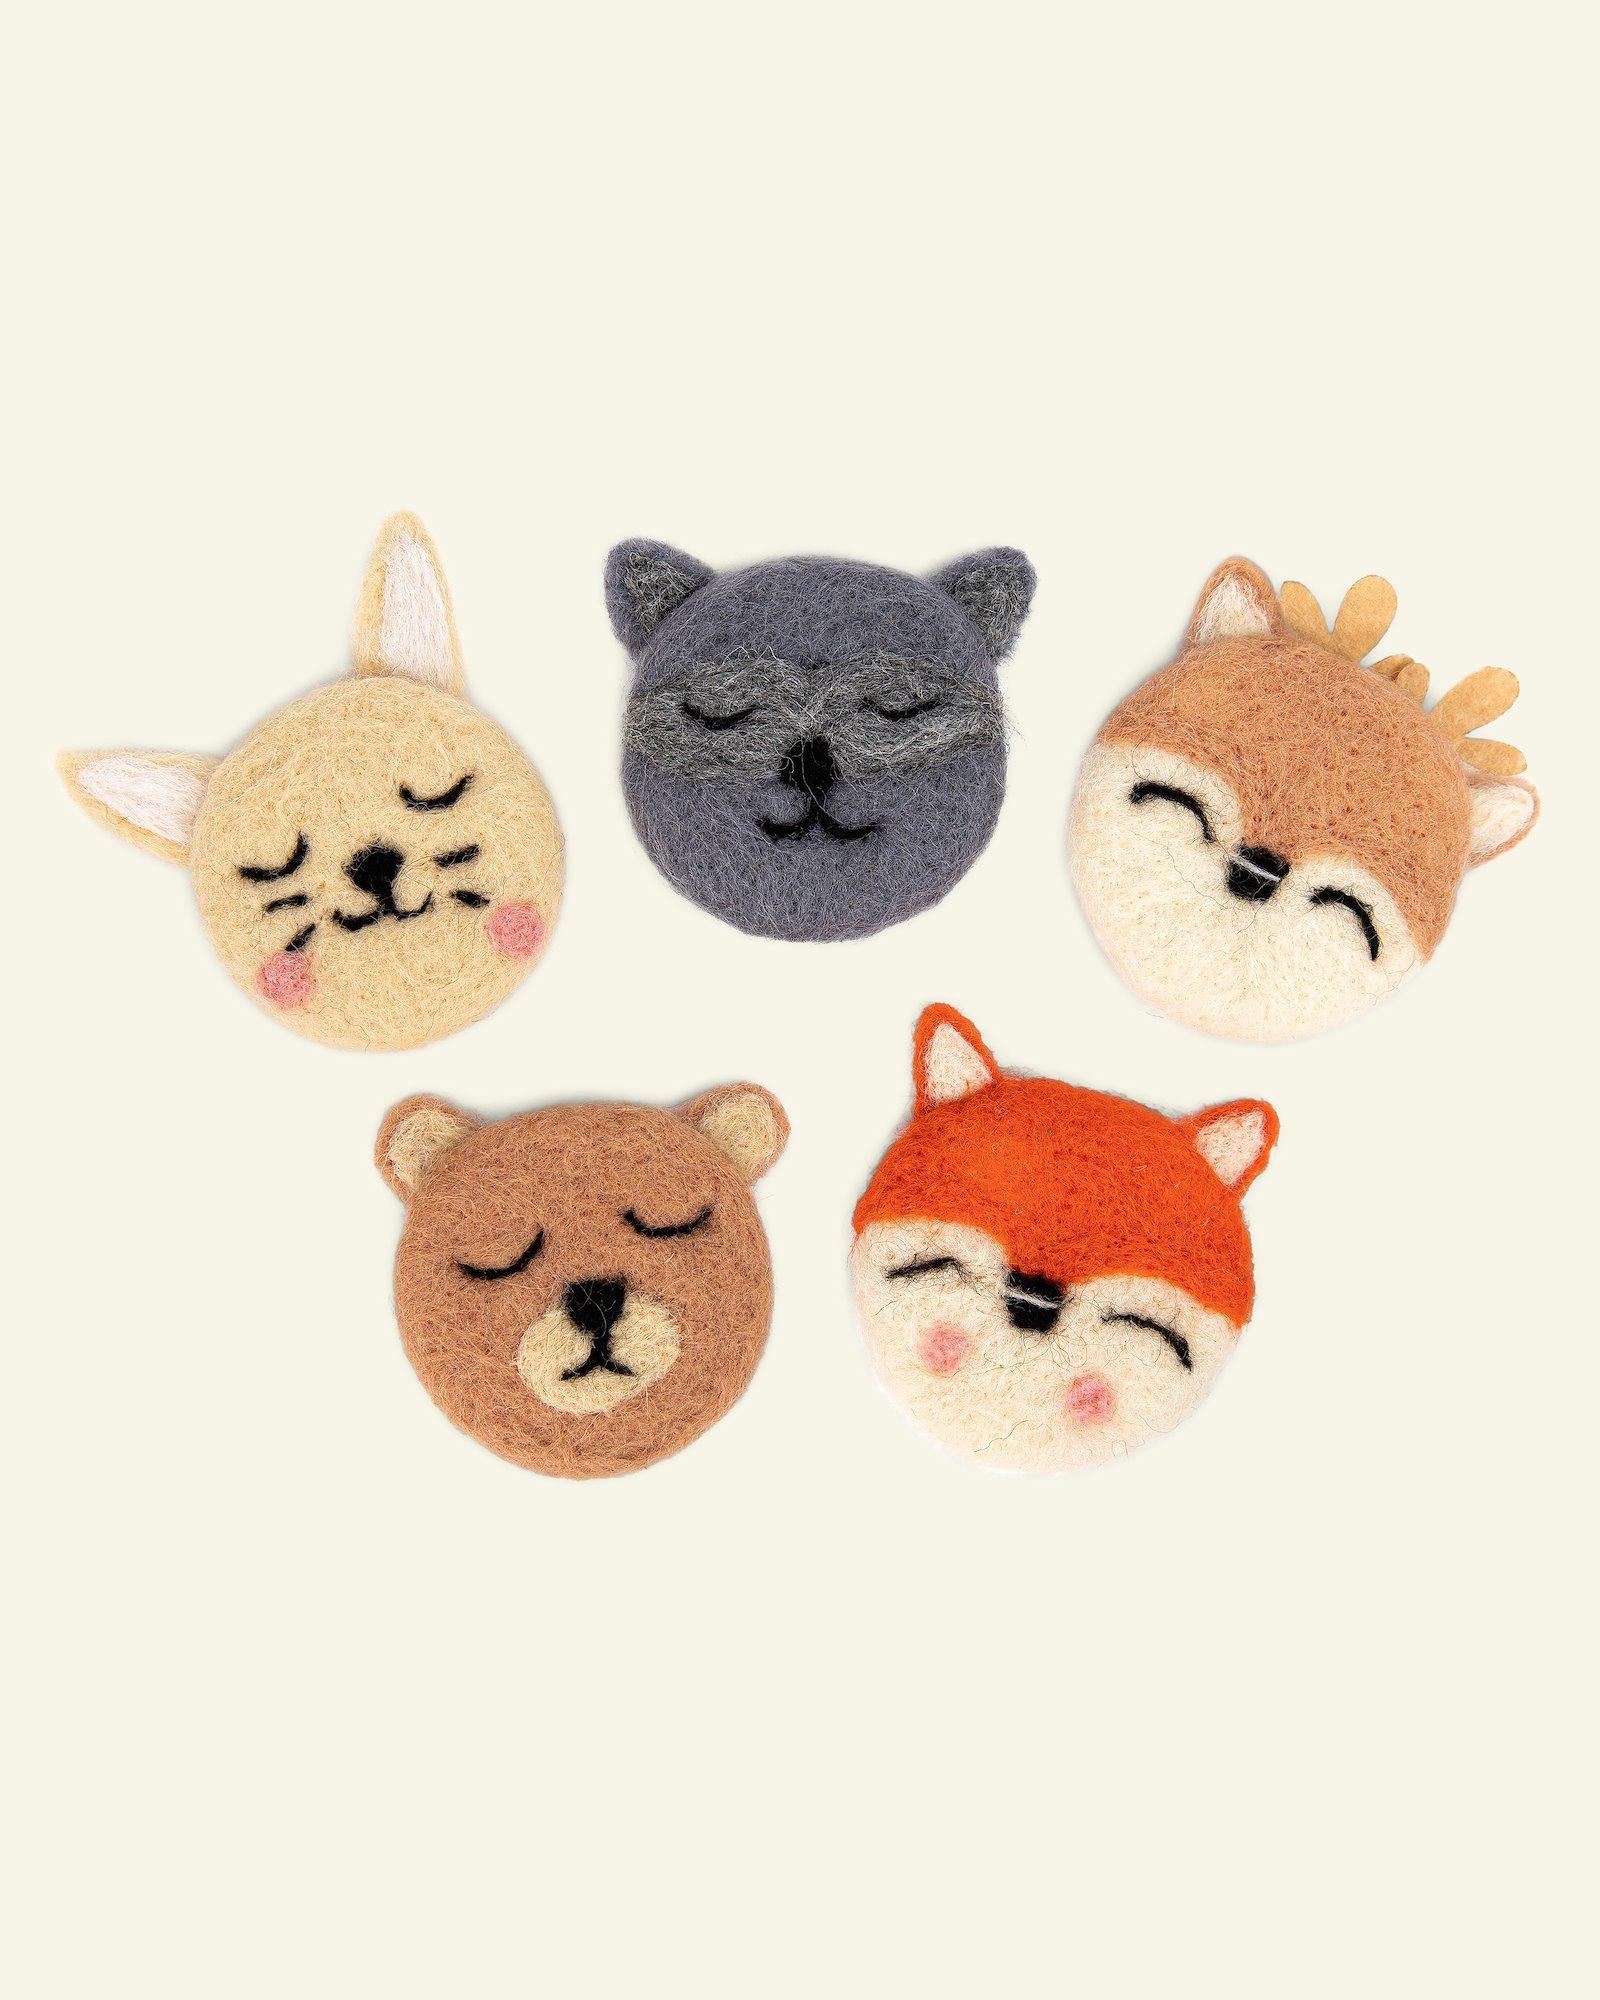 Kit wool animals 8cm 5pcs